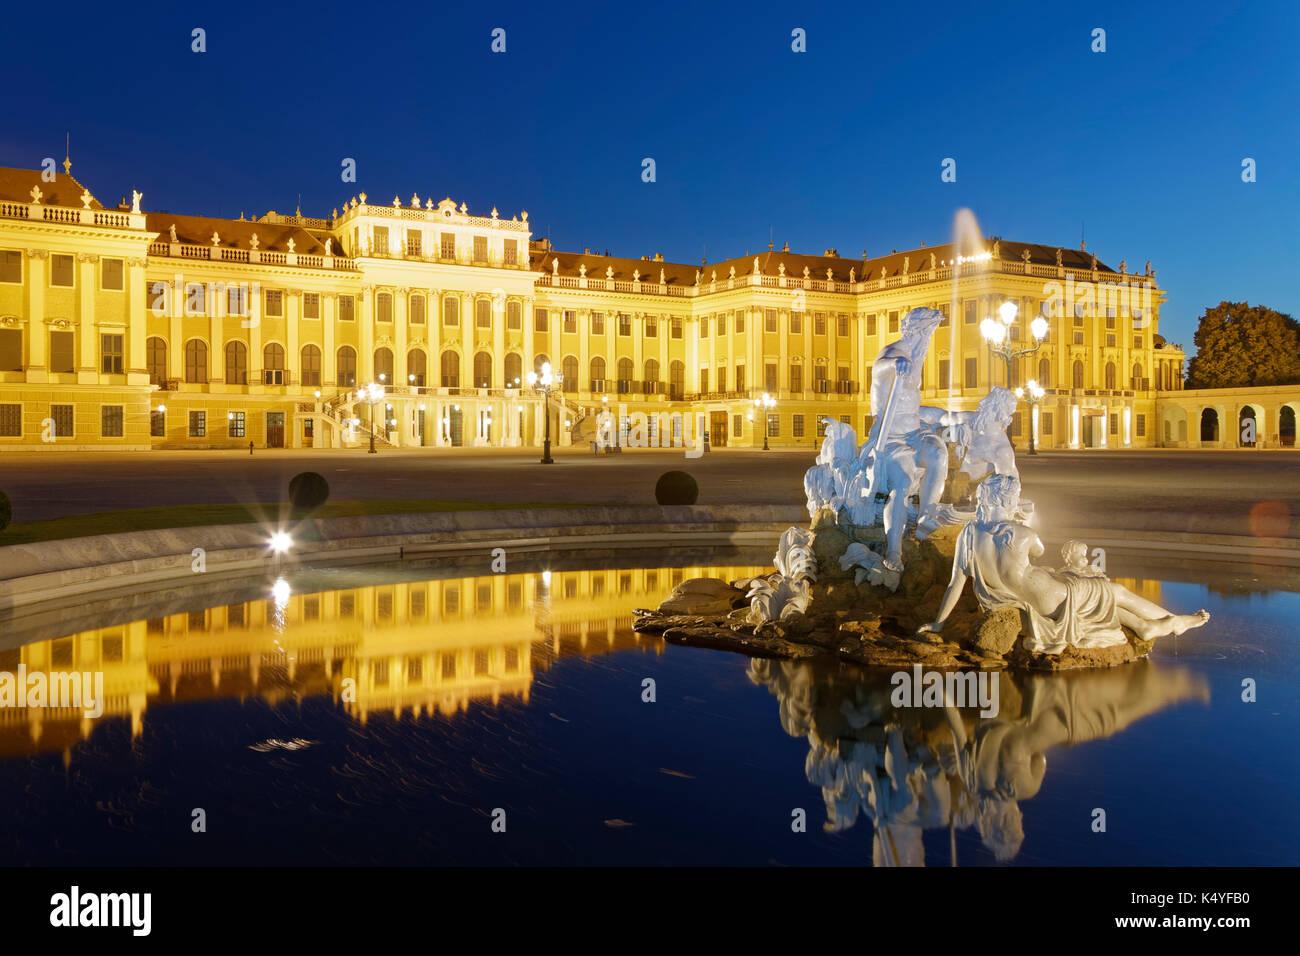 Fountain in front of Schönbrunn Palace, Vienna, Austria - Stock Image